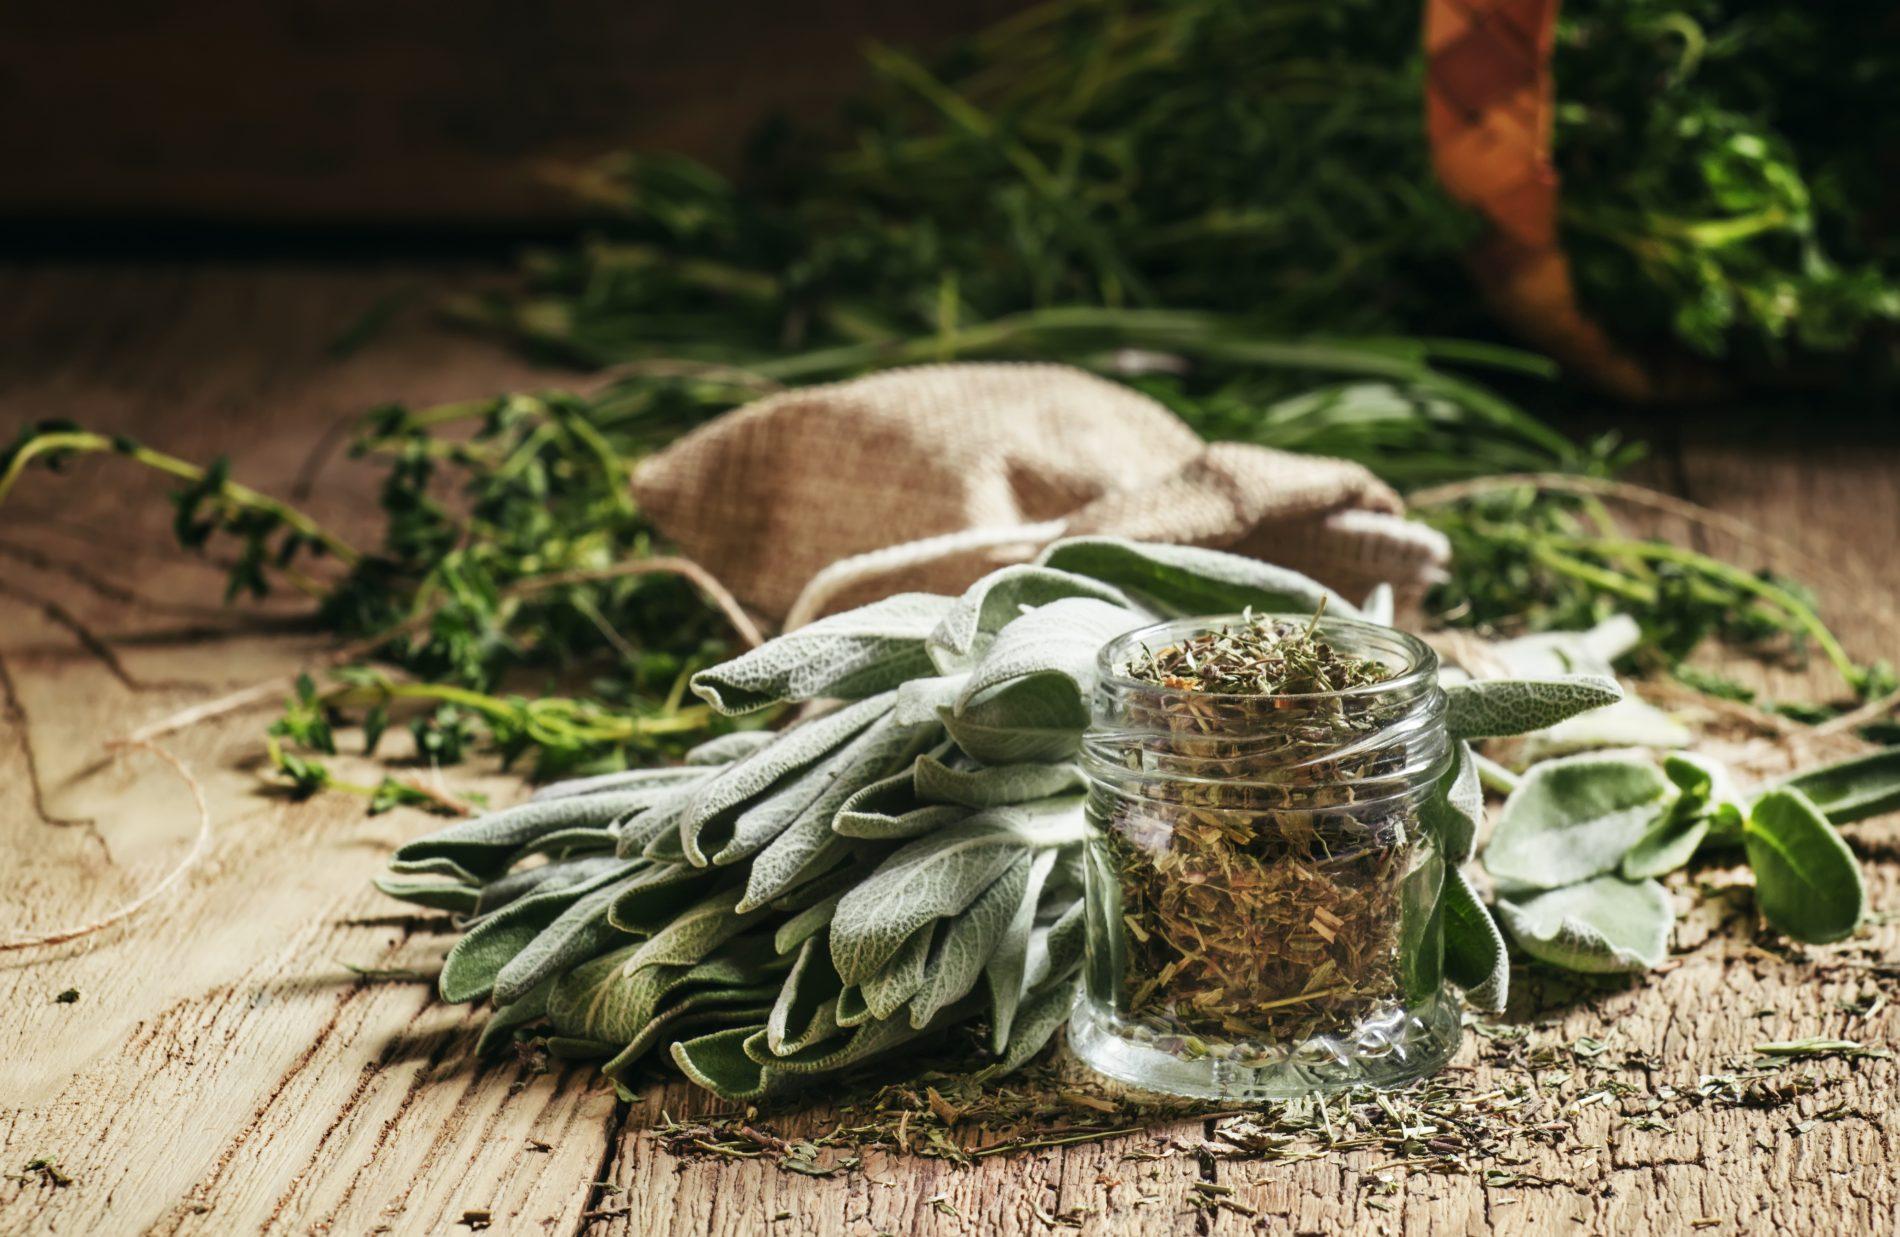 salvia: cos'è, benefici, proprietà e ricette di bellezza e cucina